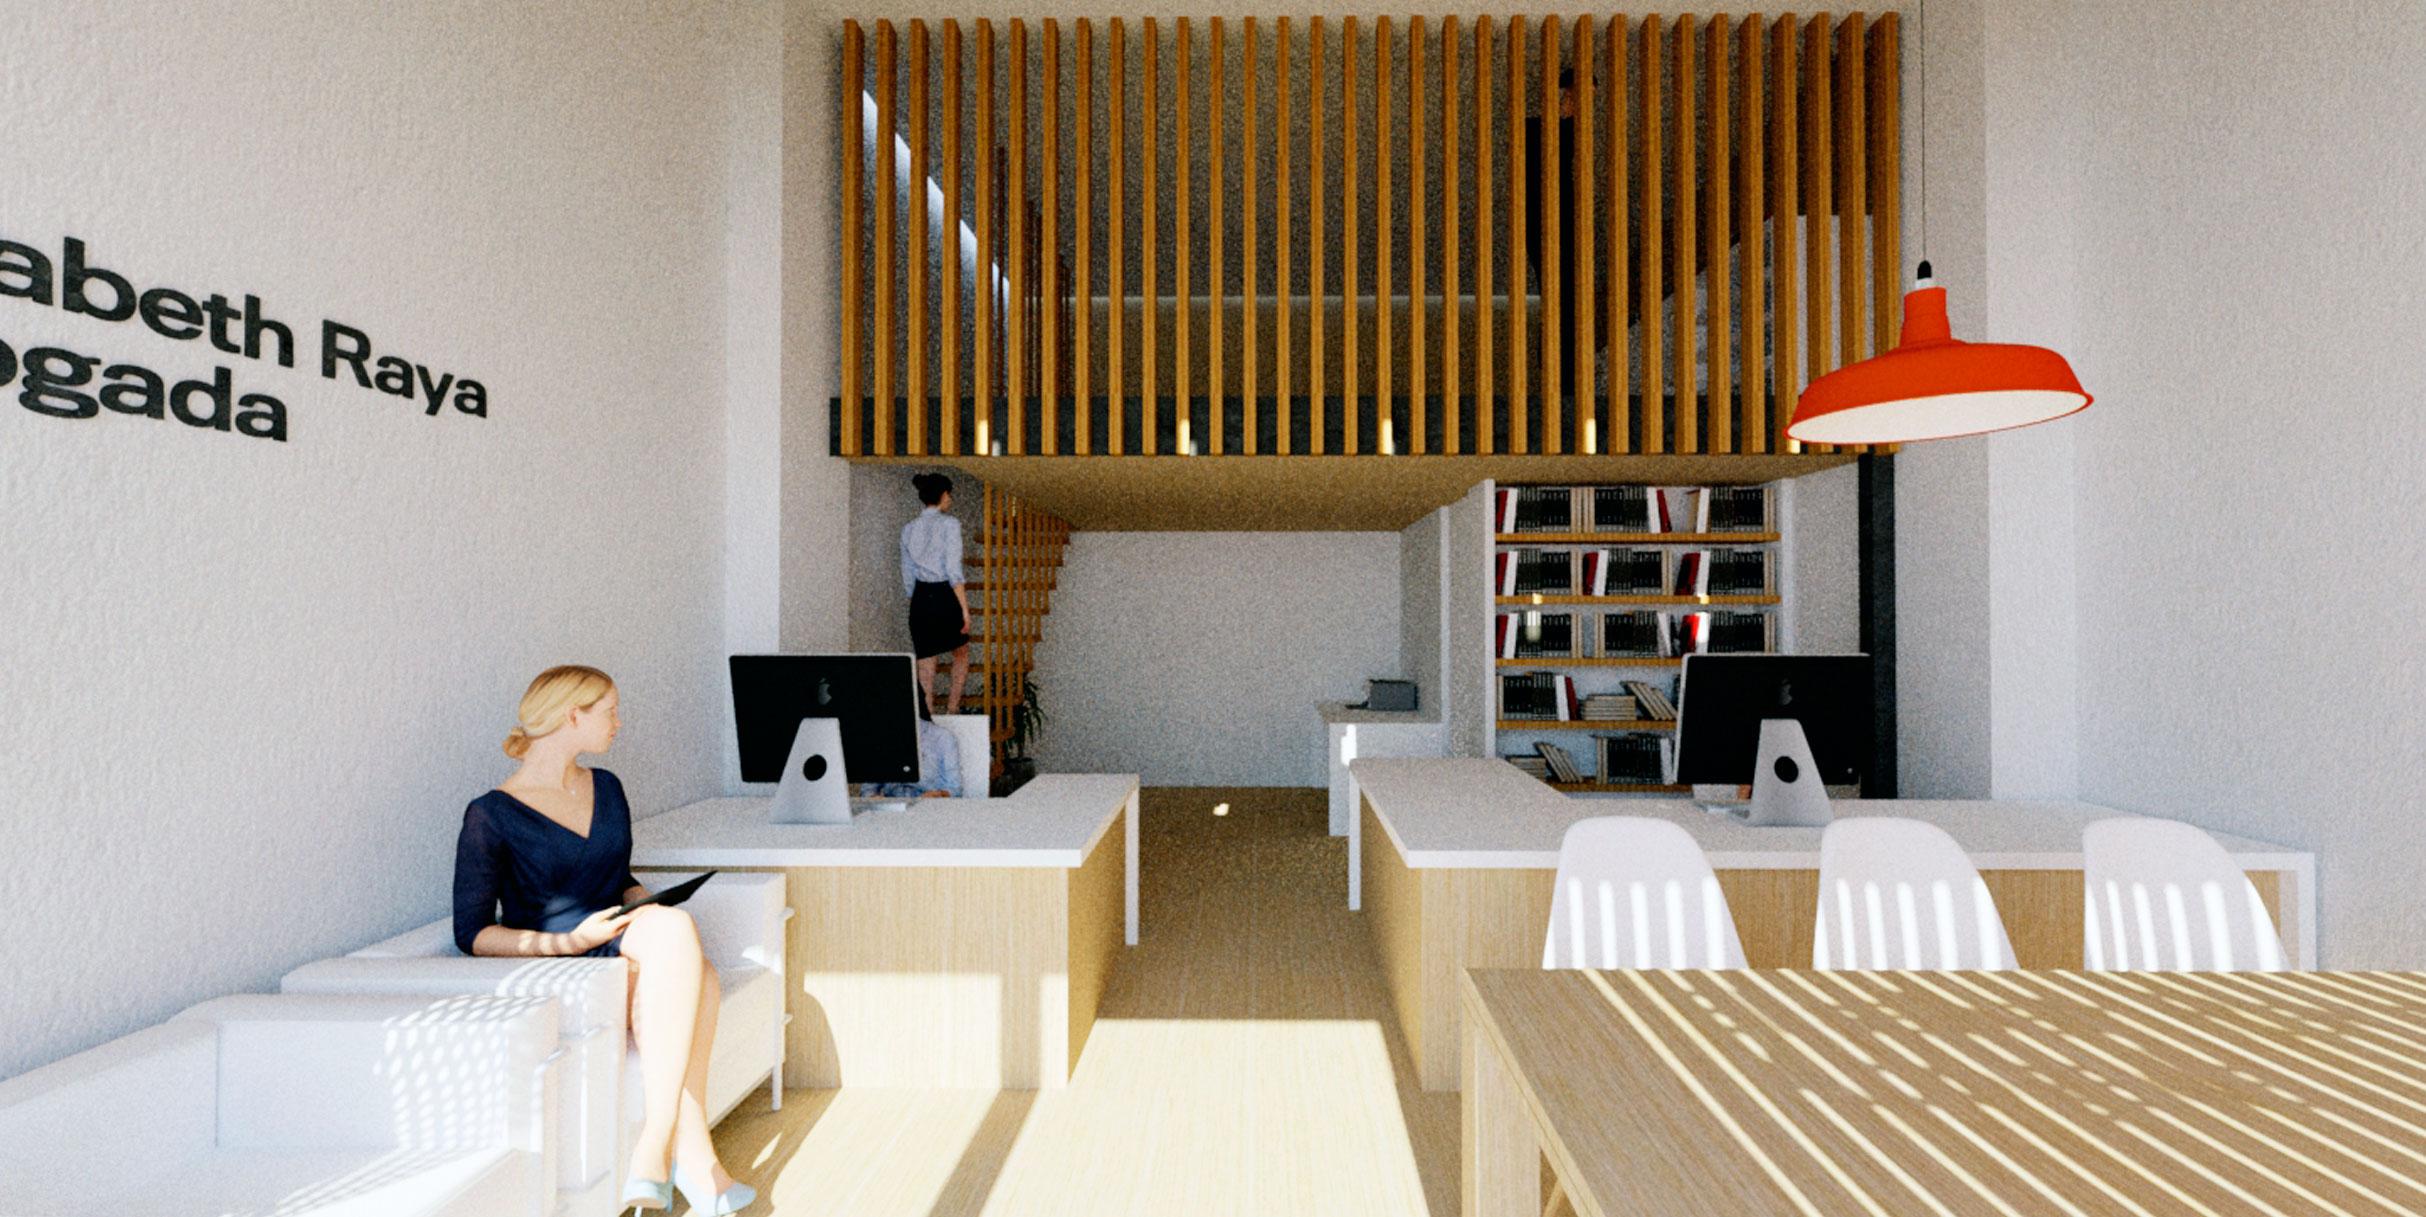 Jaime salv arquitectura interiorismo j542 despacho for Despacho arquitectura